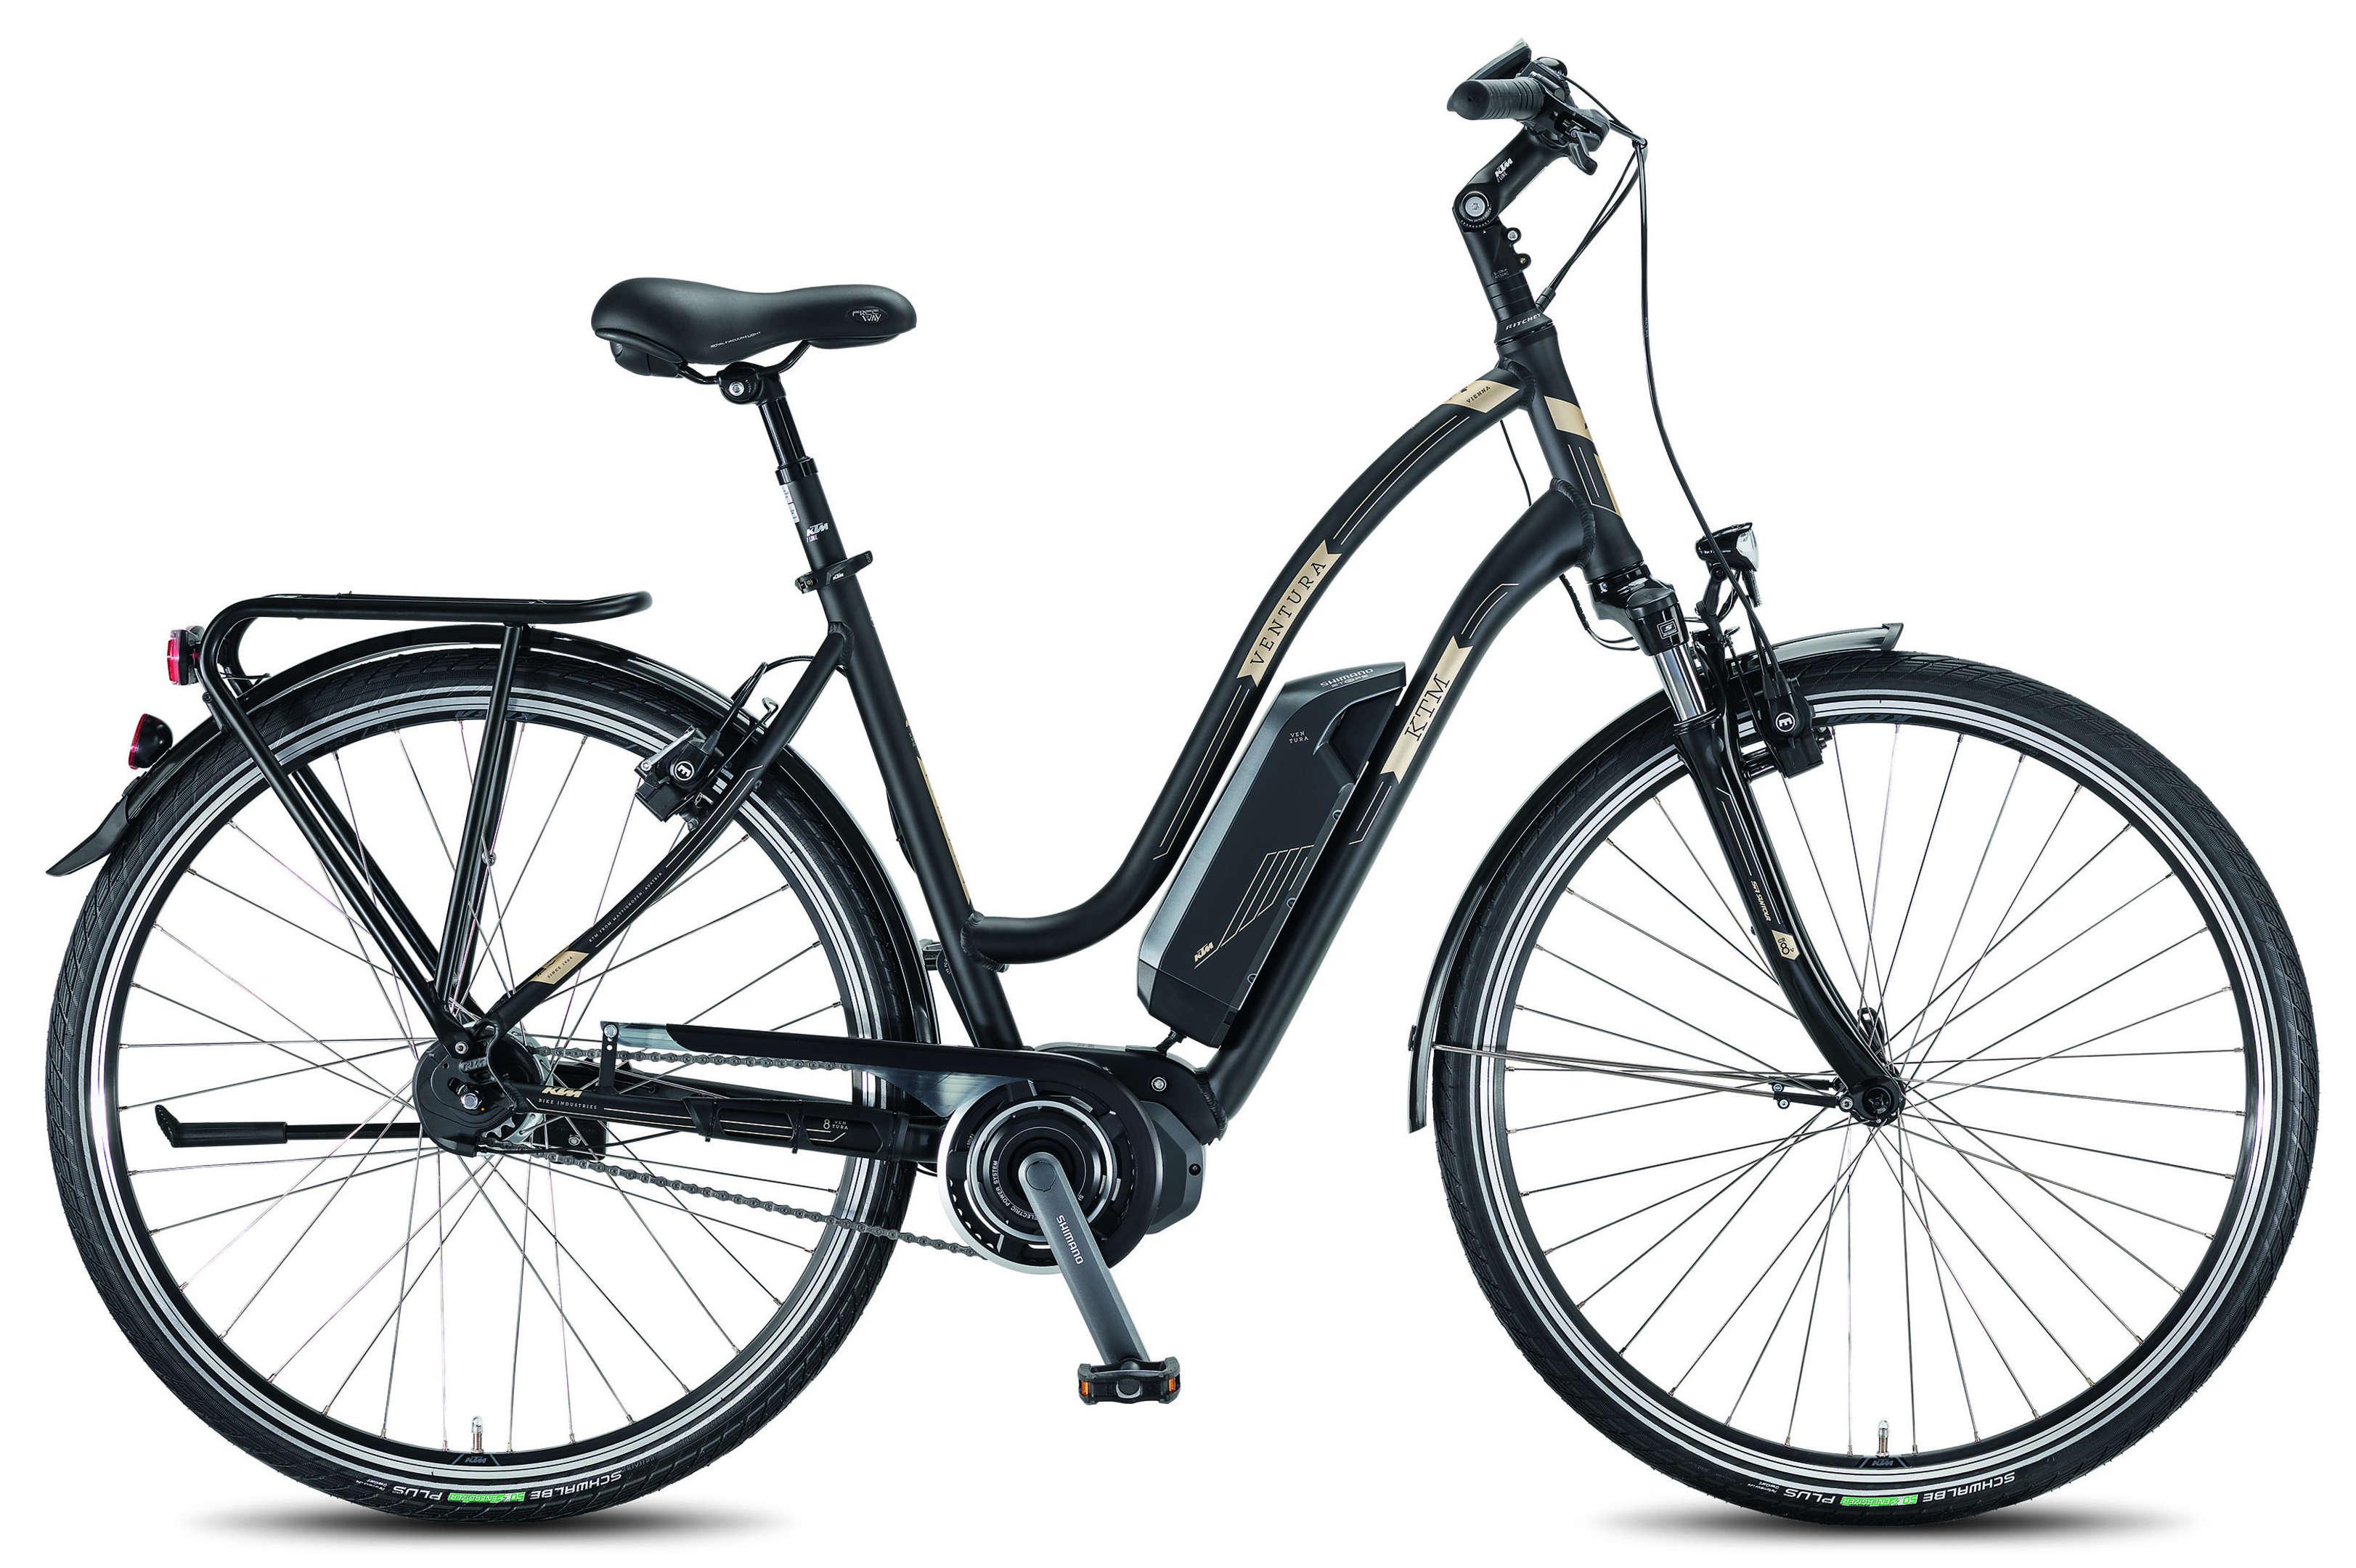 ktm e bike ventura vienna 8 di2 eurorad bikeleasingeurorad bikeleasing. Black Bedroom Furniture Sets. Home Design Ideas